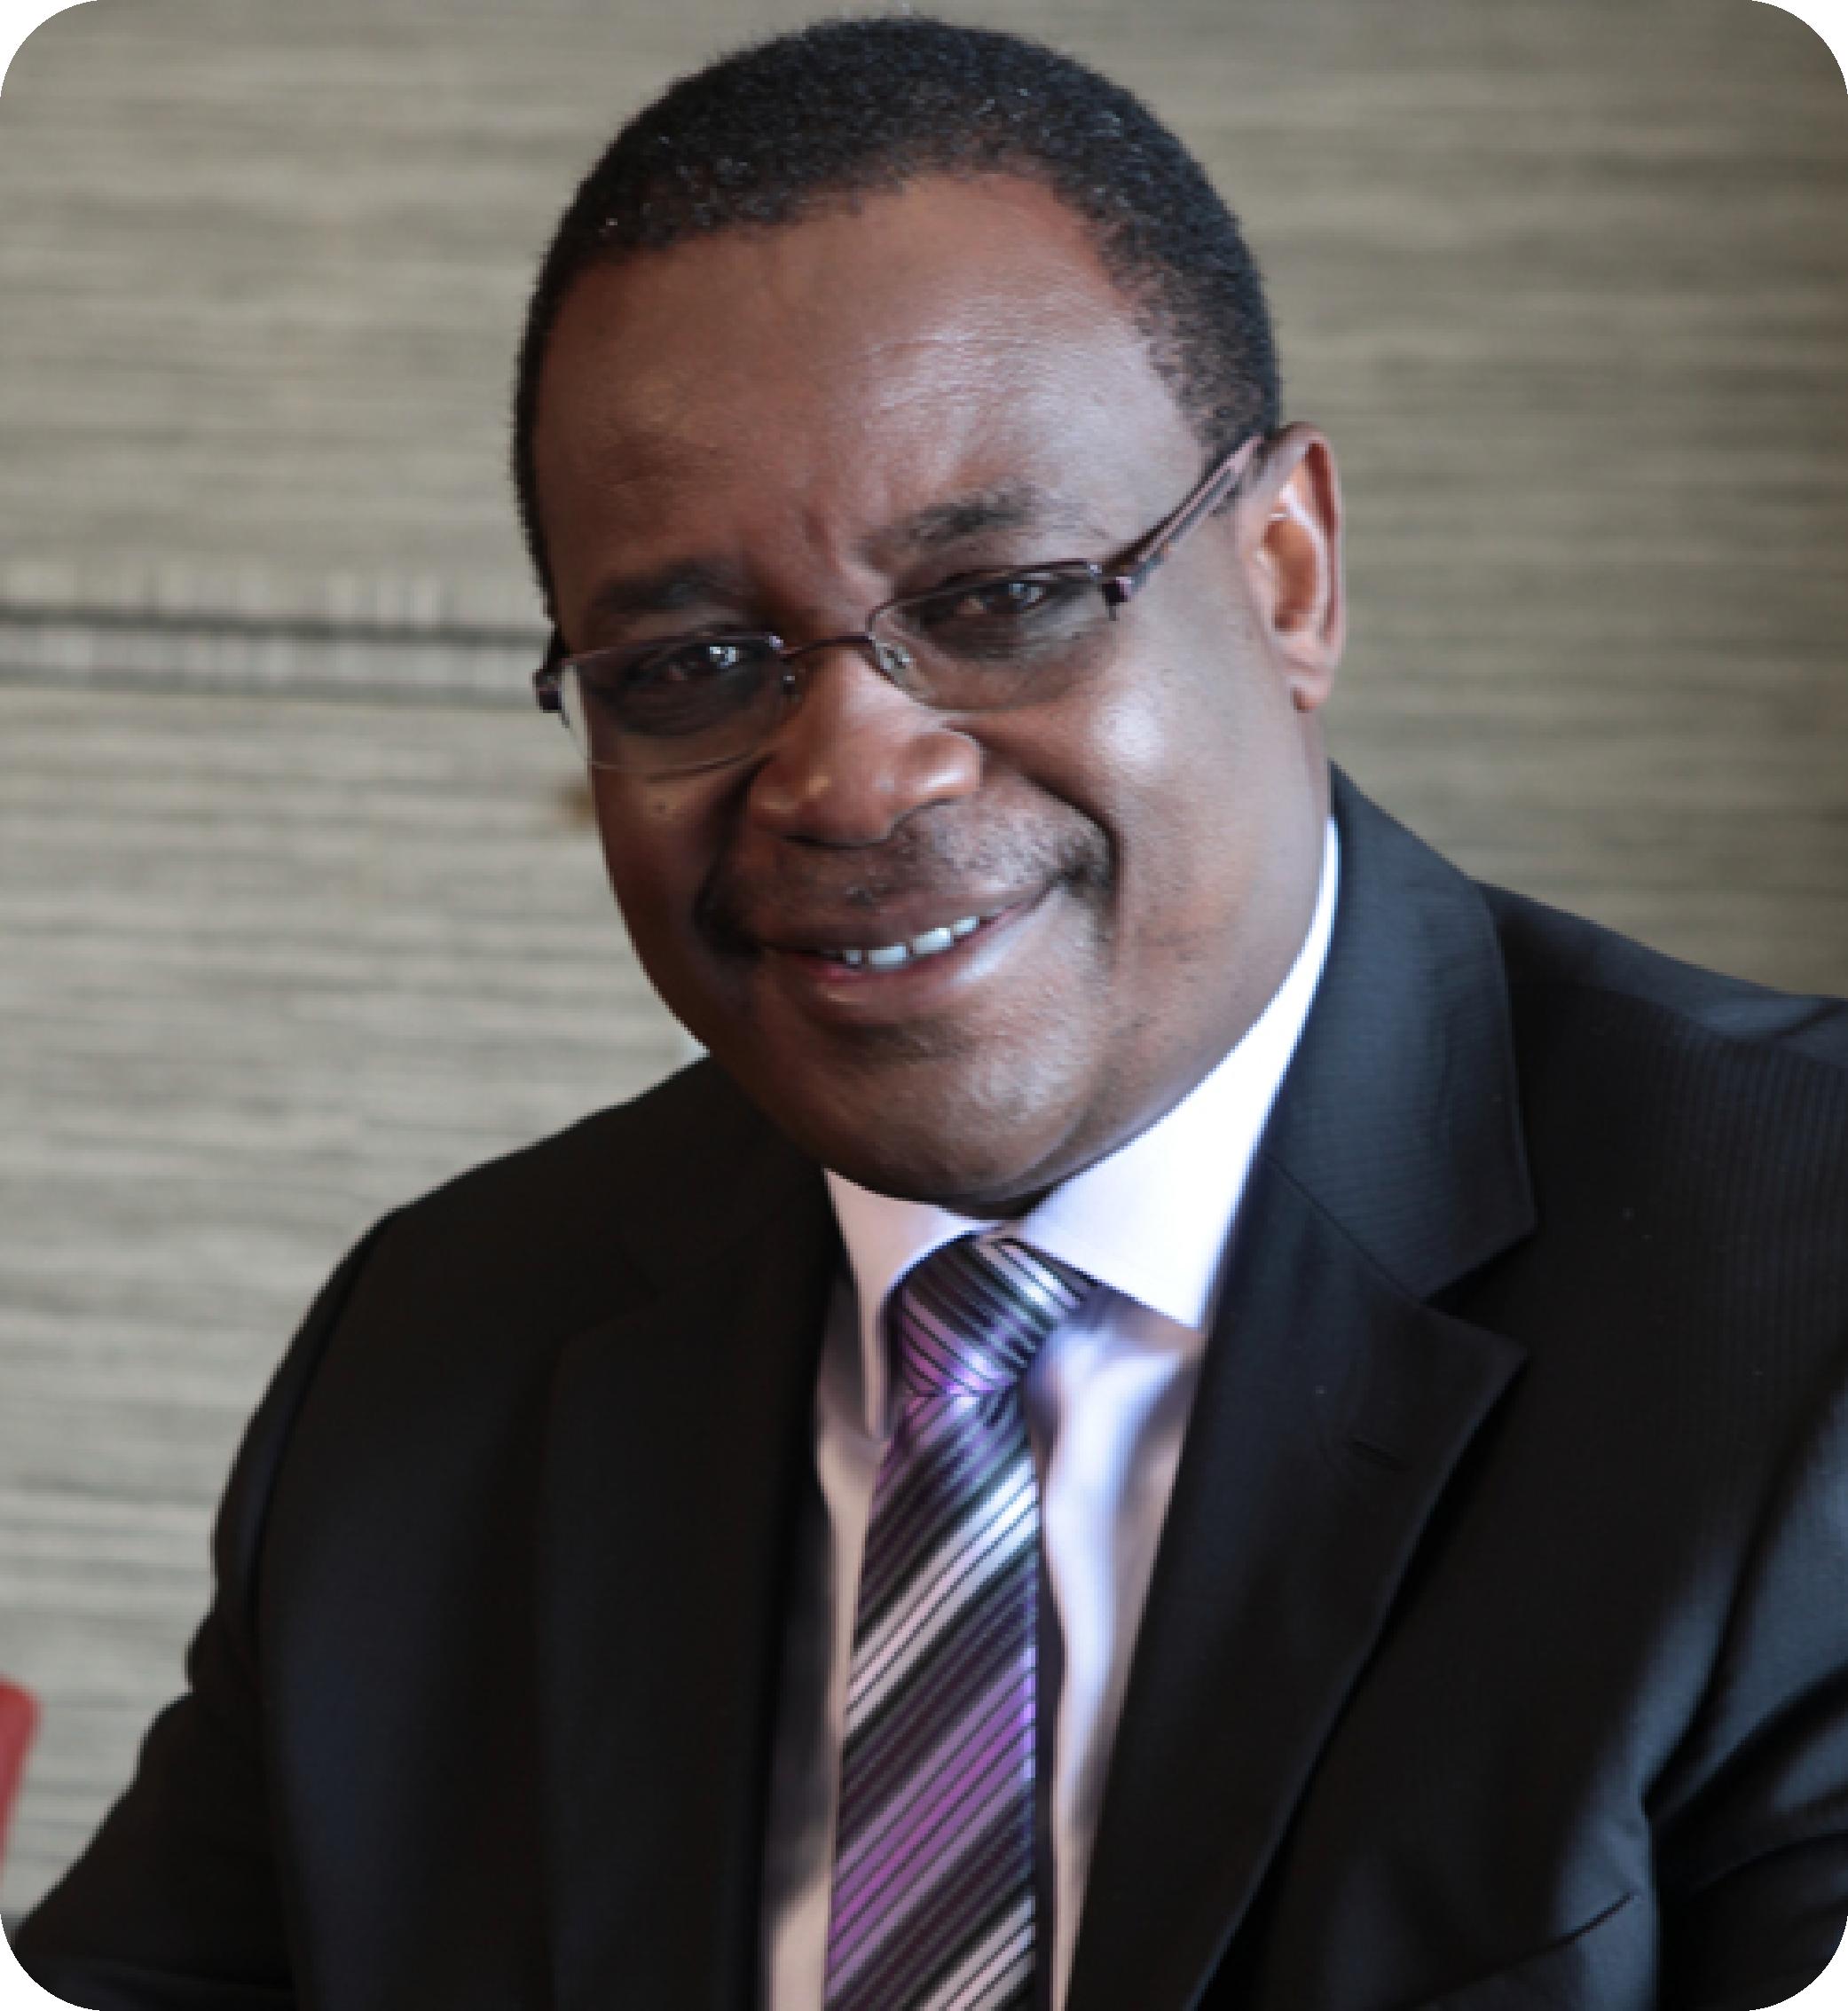 Evans Odhiambo Kidero